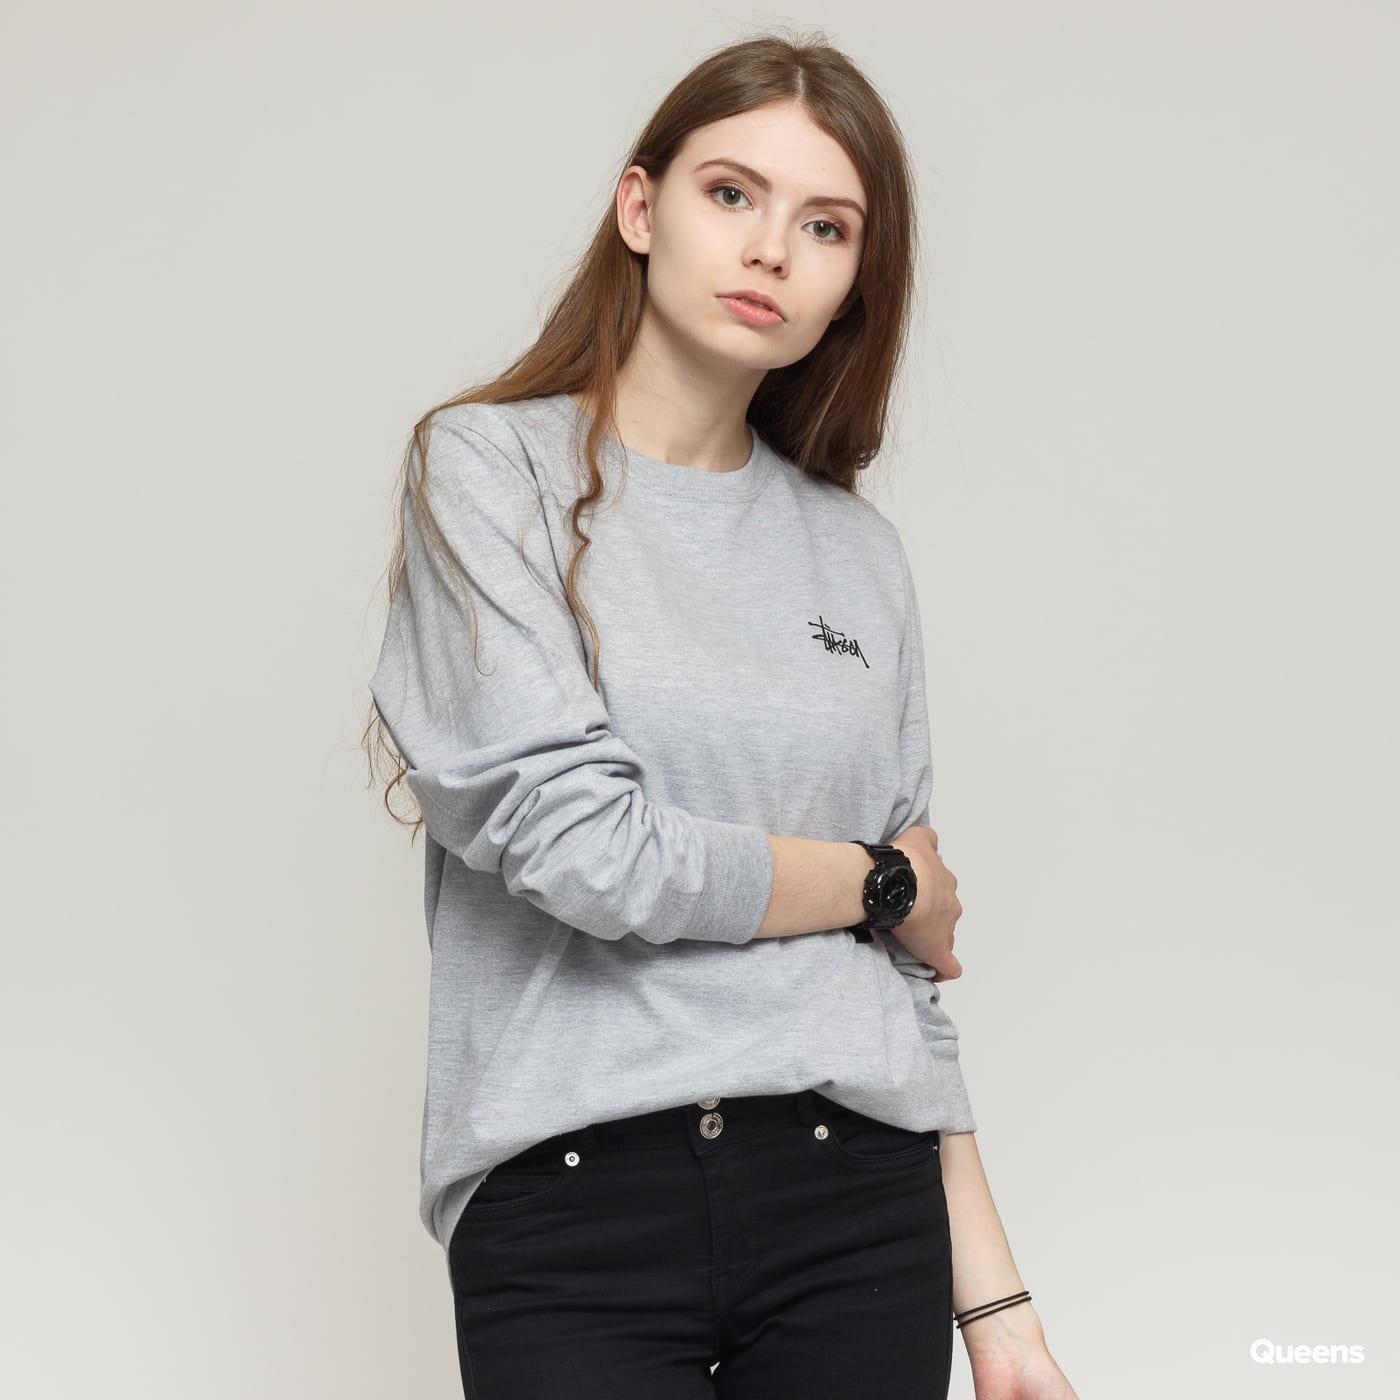 43316407ea6c Dámske tričko s dlhým rukávom Stüssy Basic Stussy LS Tee (2992600   0009)–  Queens 💚